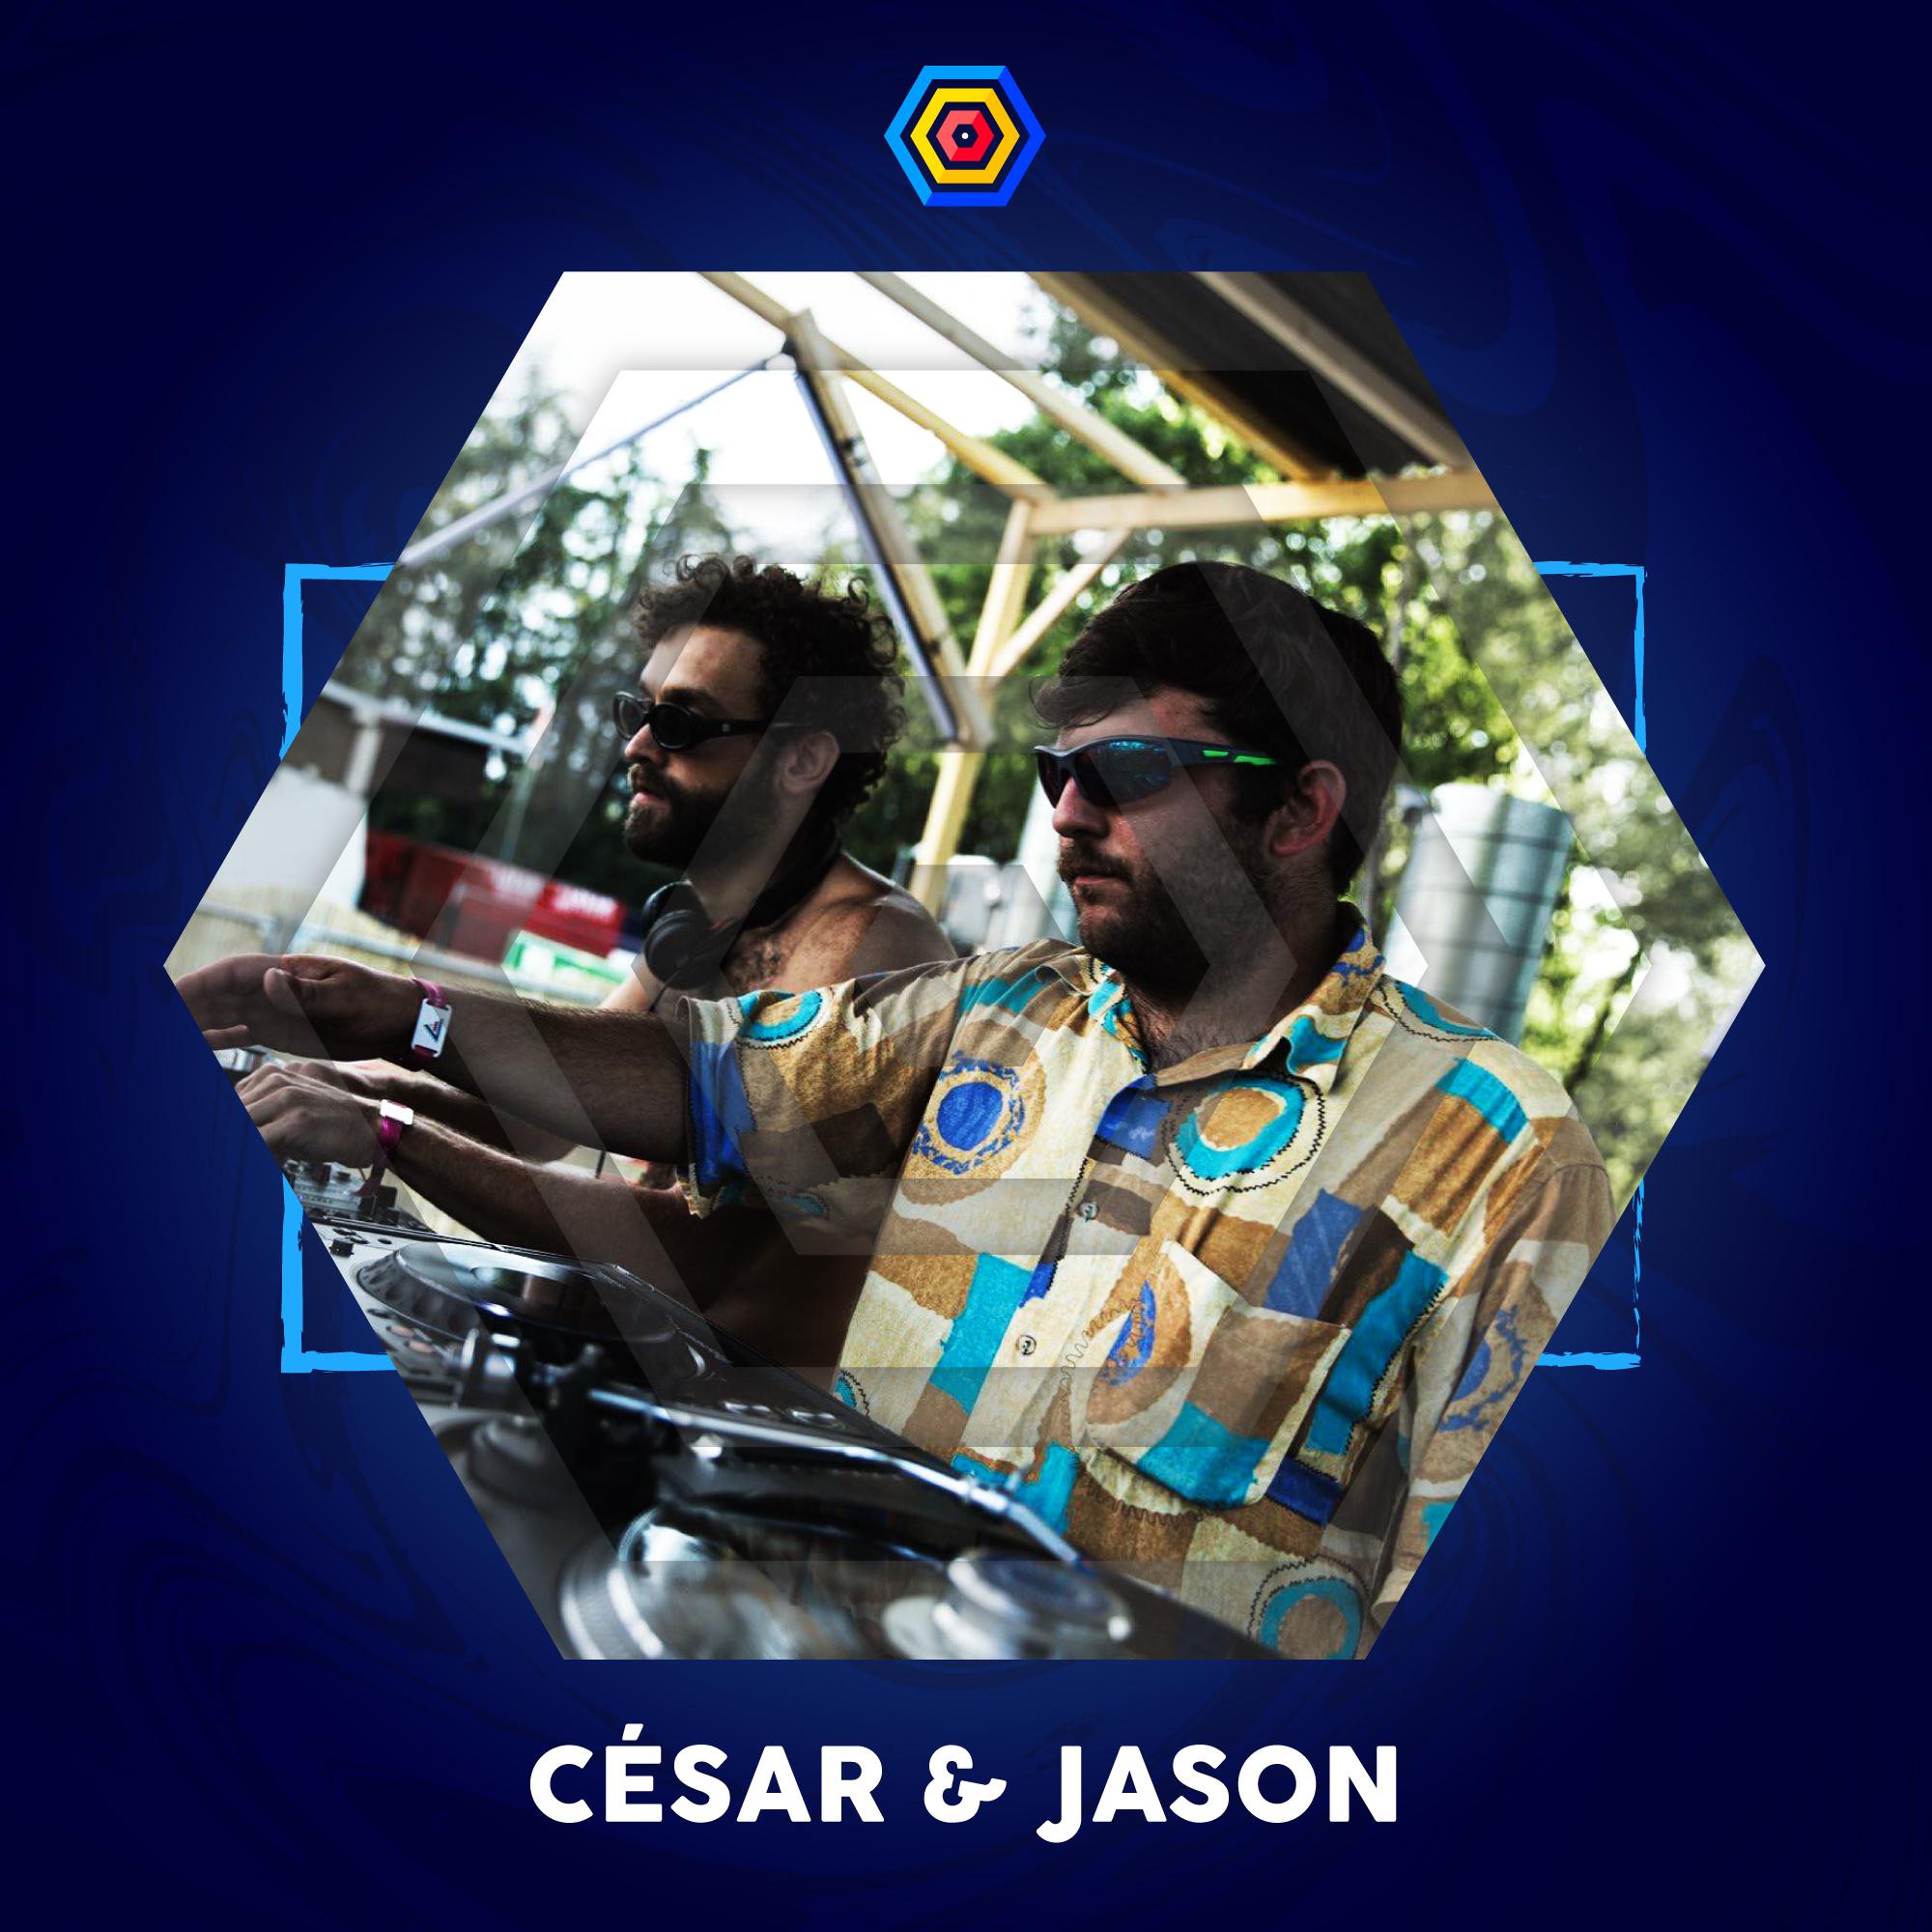 César & Jason